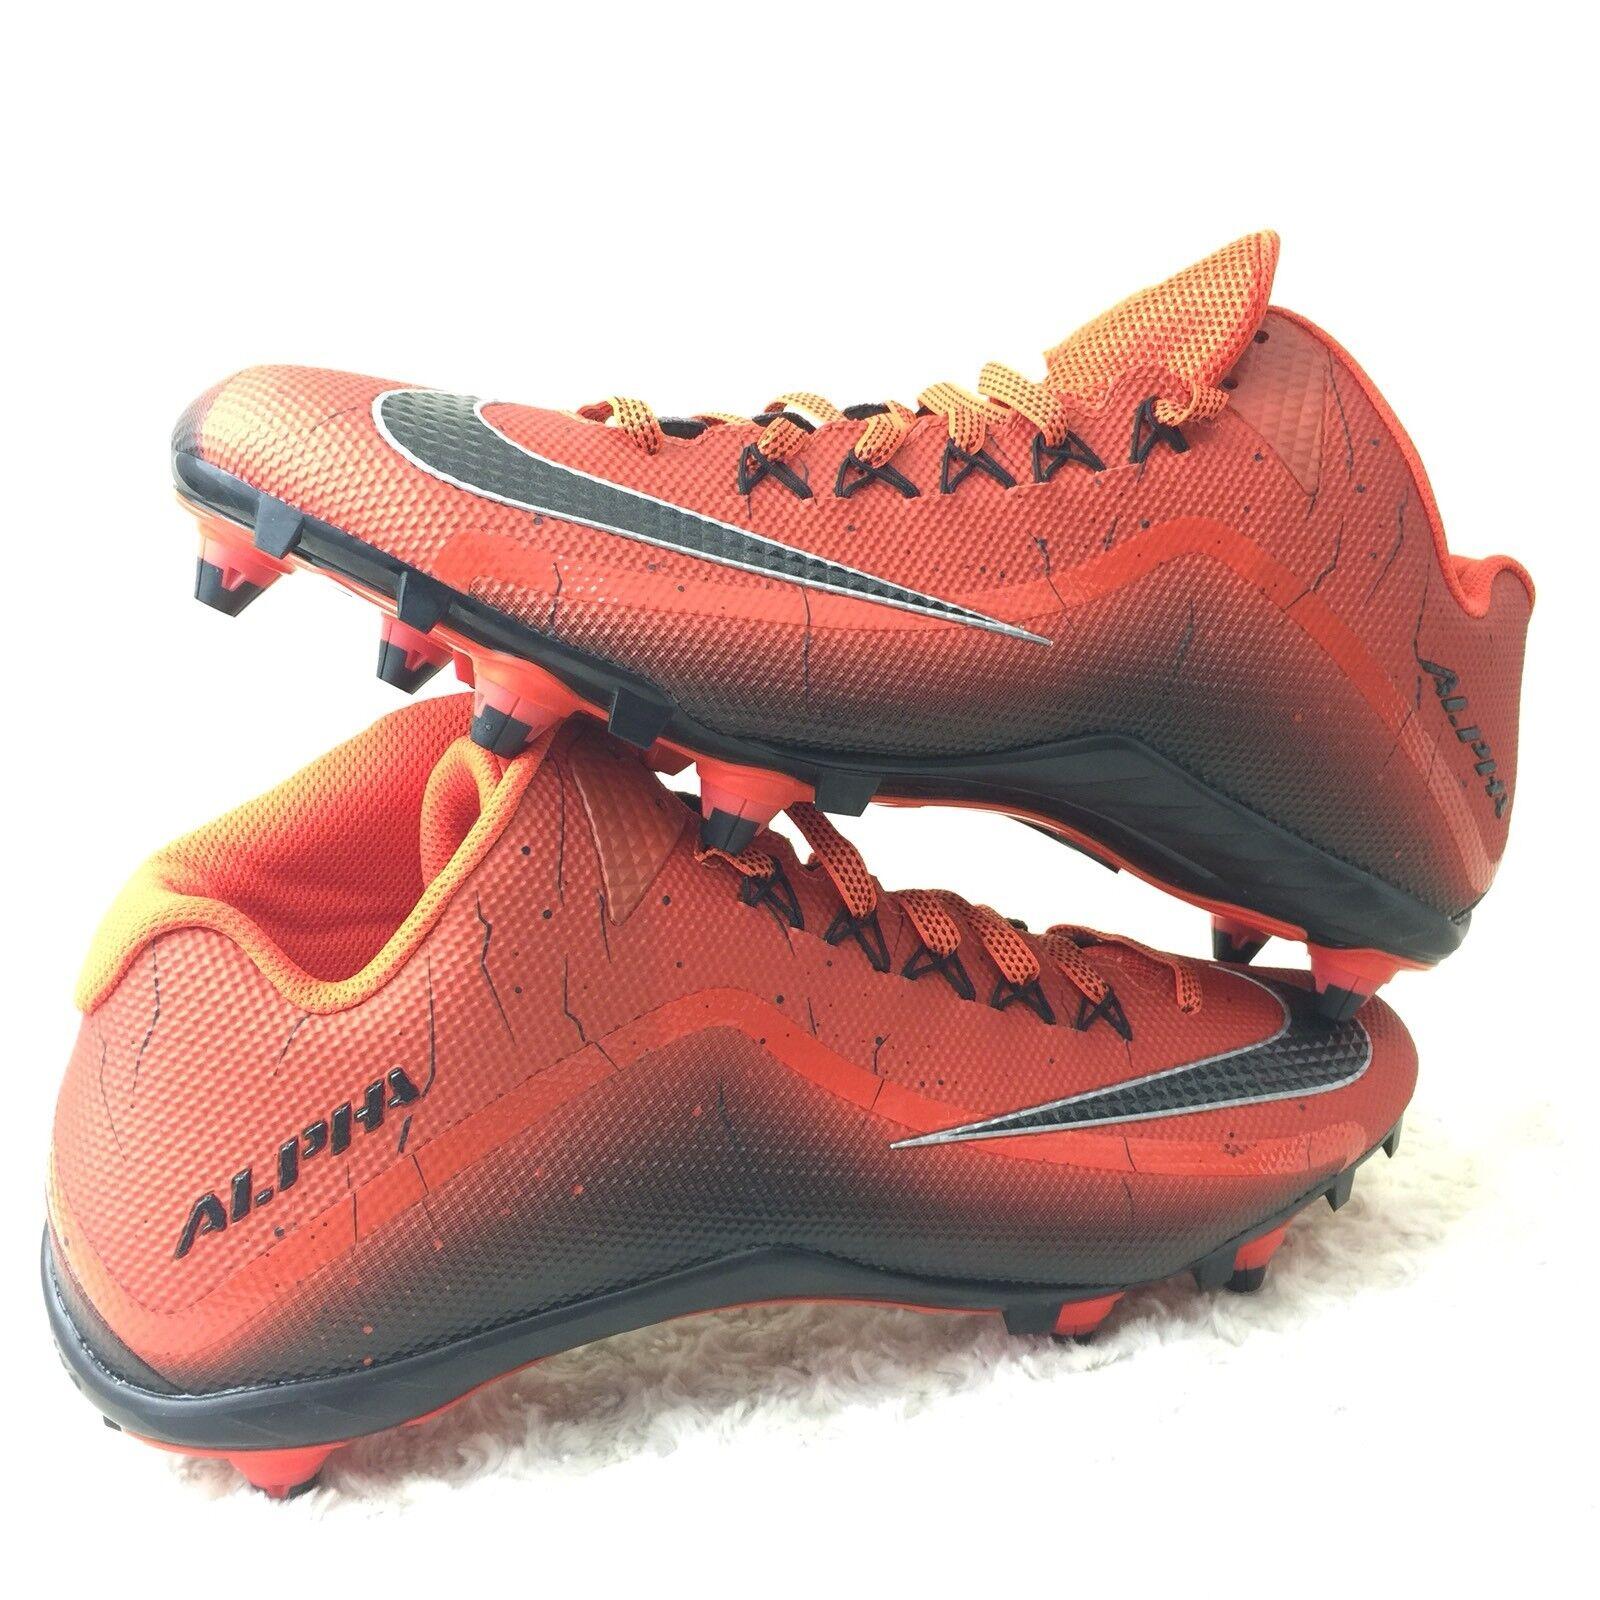 Nike Alpha Pro 2D Skin football Cleats Men Sz 16 US Shoes Orange 705409-800 New